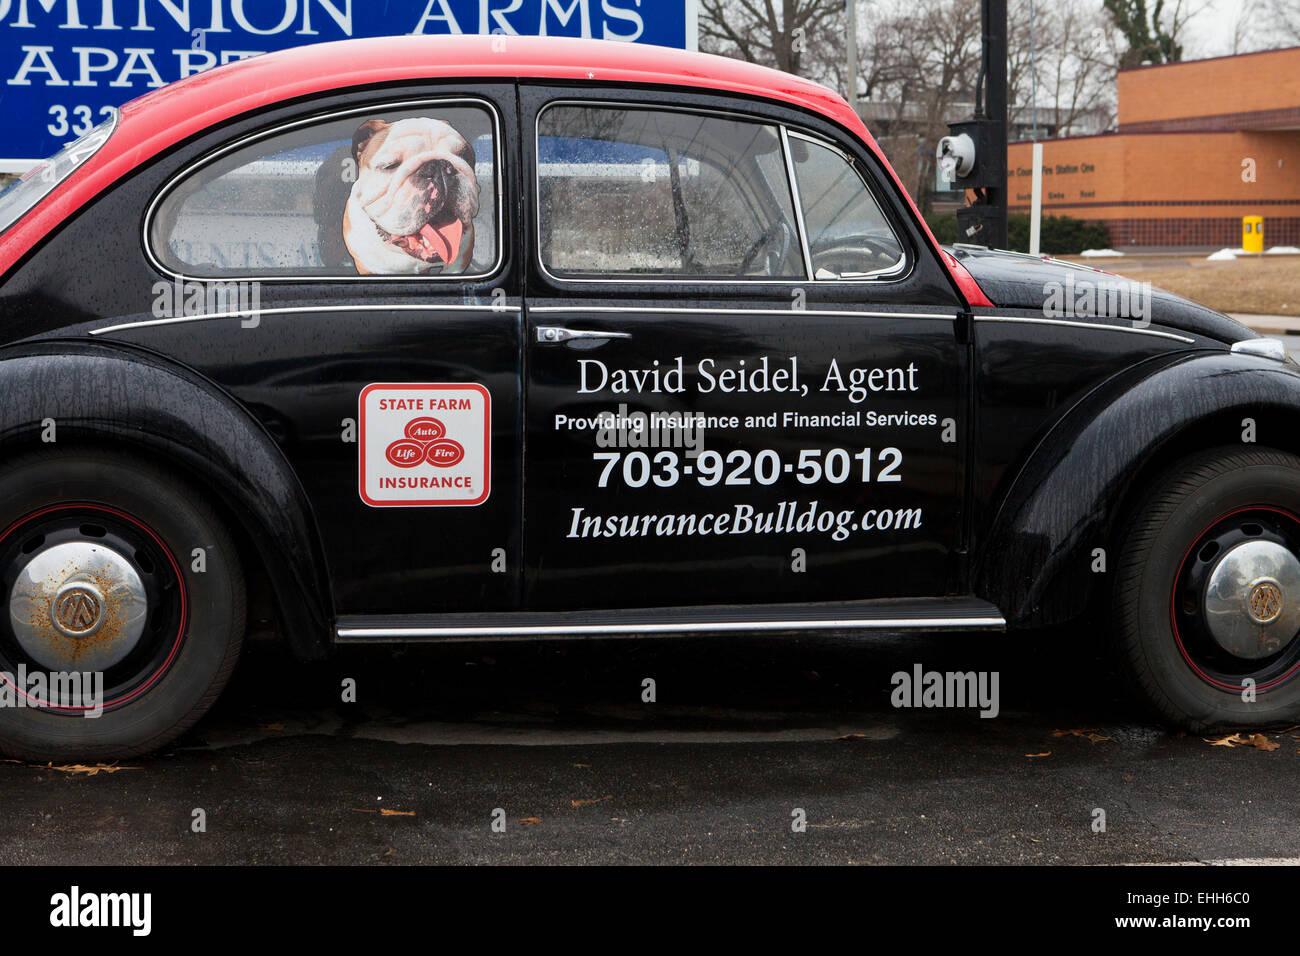 State Farm Insurance agent ad on VW 1970s vintage beetle - Virginia USA - Stock Image